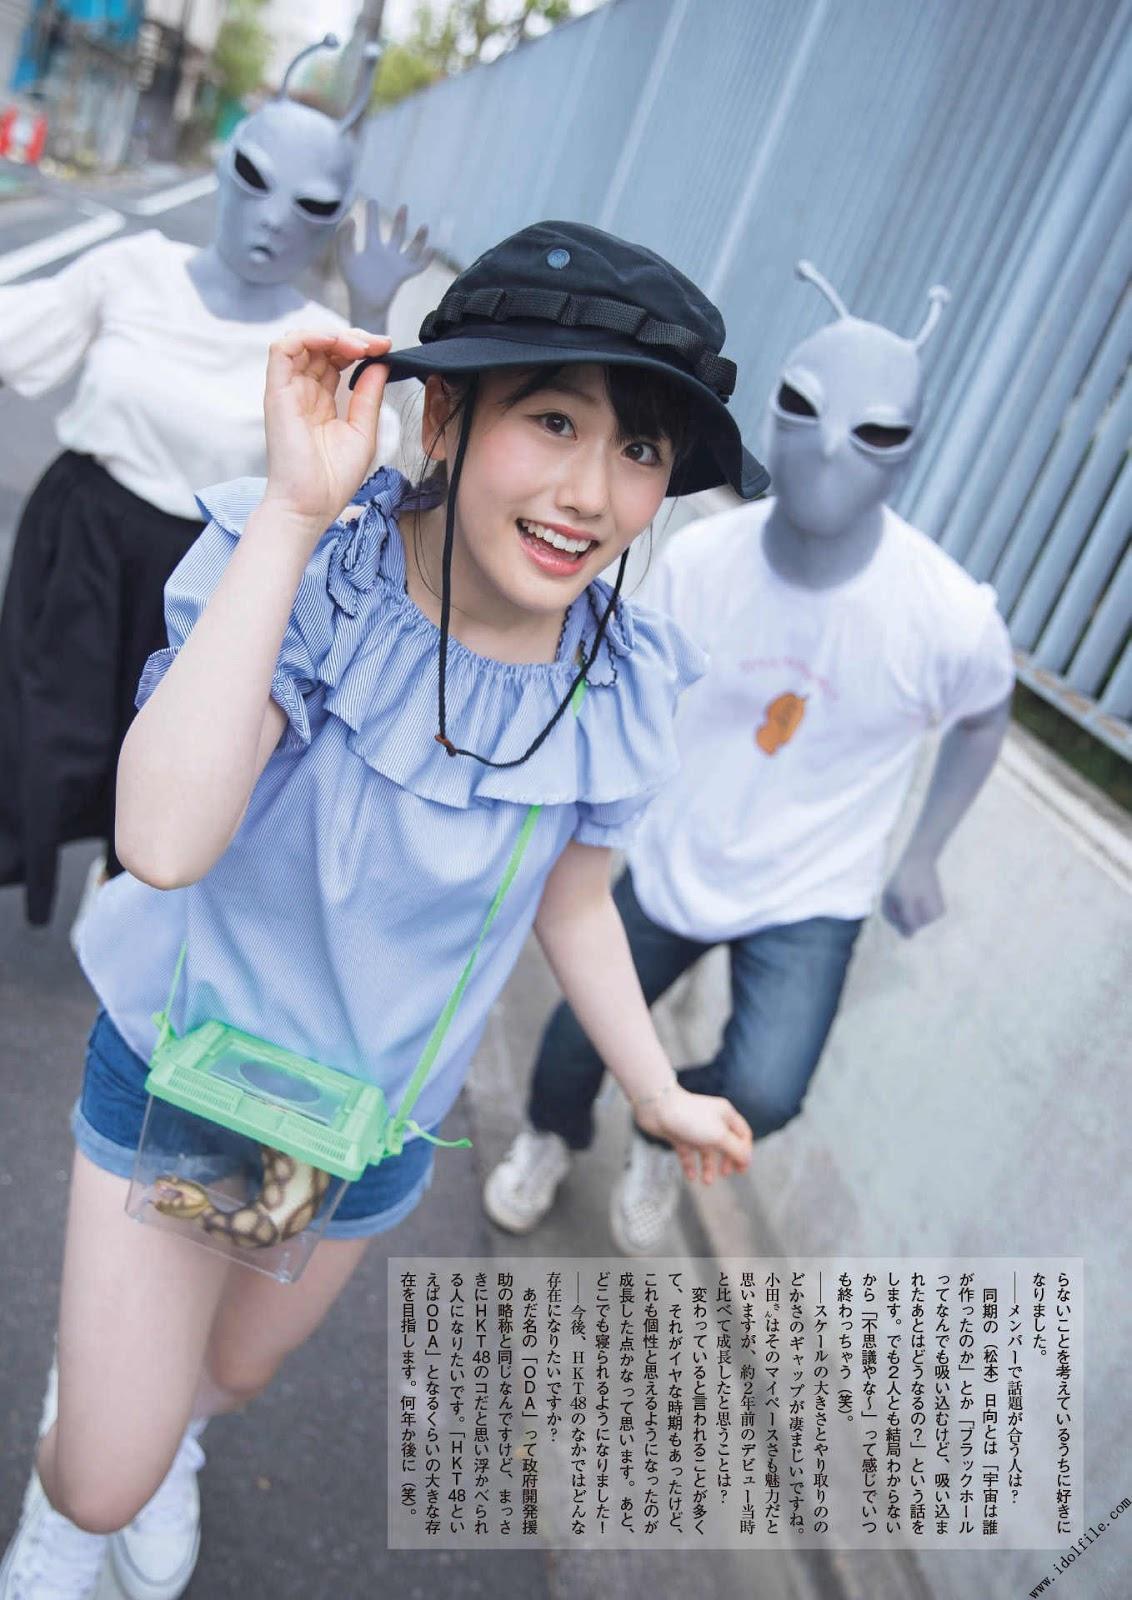 Oda Ayaka 小田彩加, FLASHスペシャルグラビアBEST 2018GW号